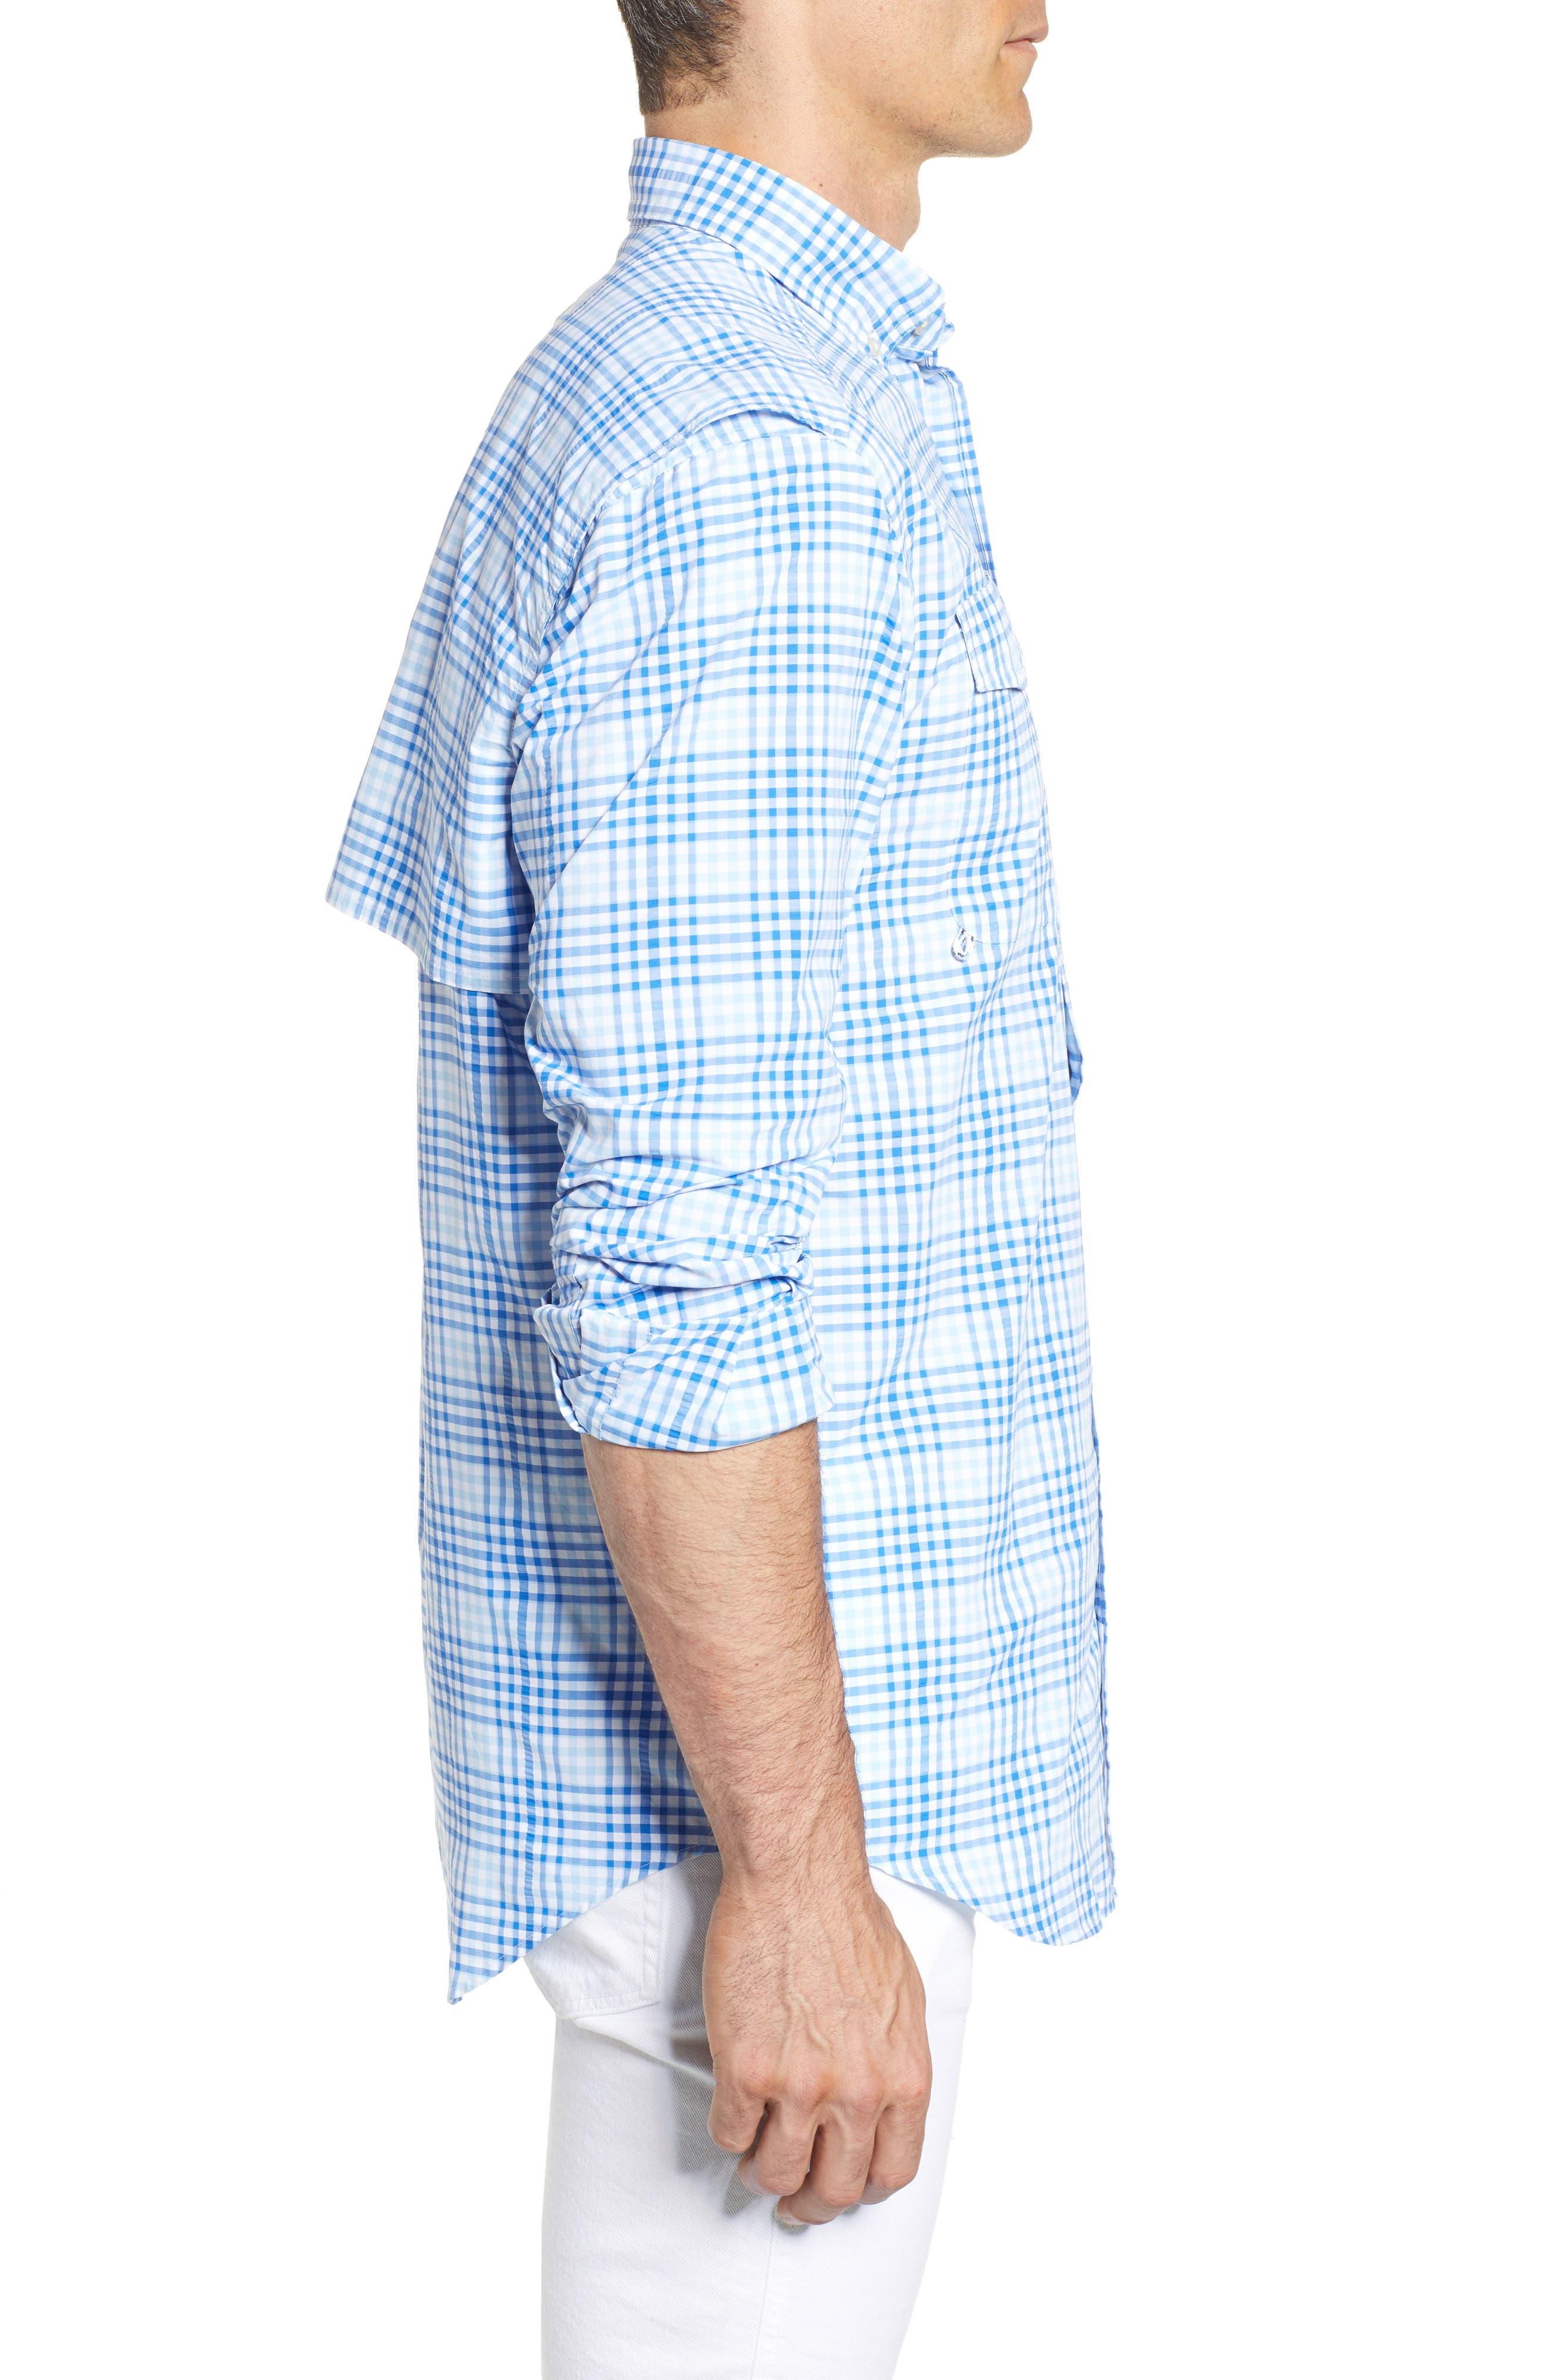 South Shore Harbor Regular Fit Plaid Performance Sport Shirt,                             Alternate thumbnail 4, color,                             Jake Blue